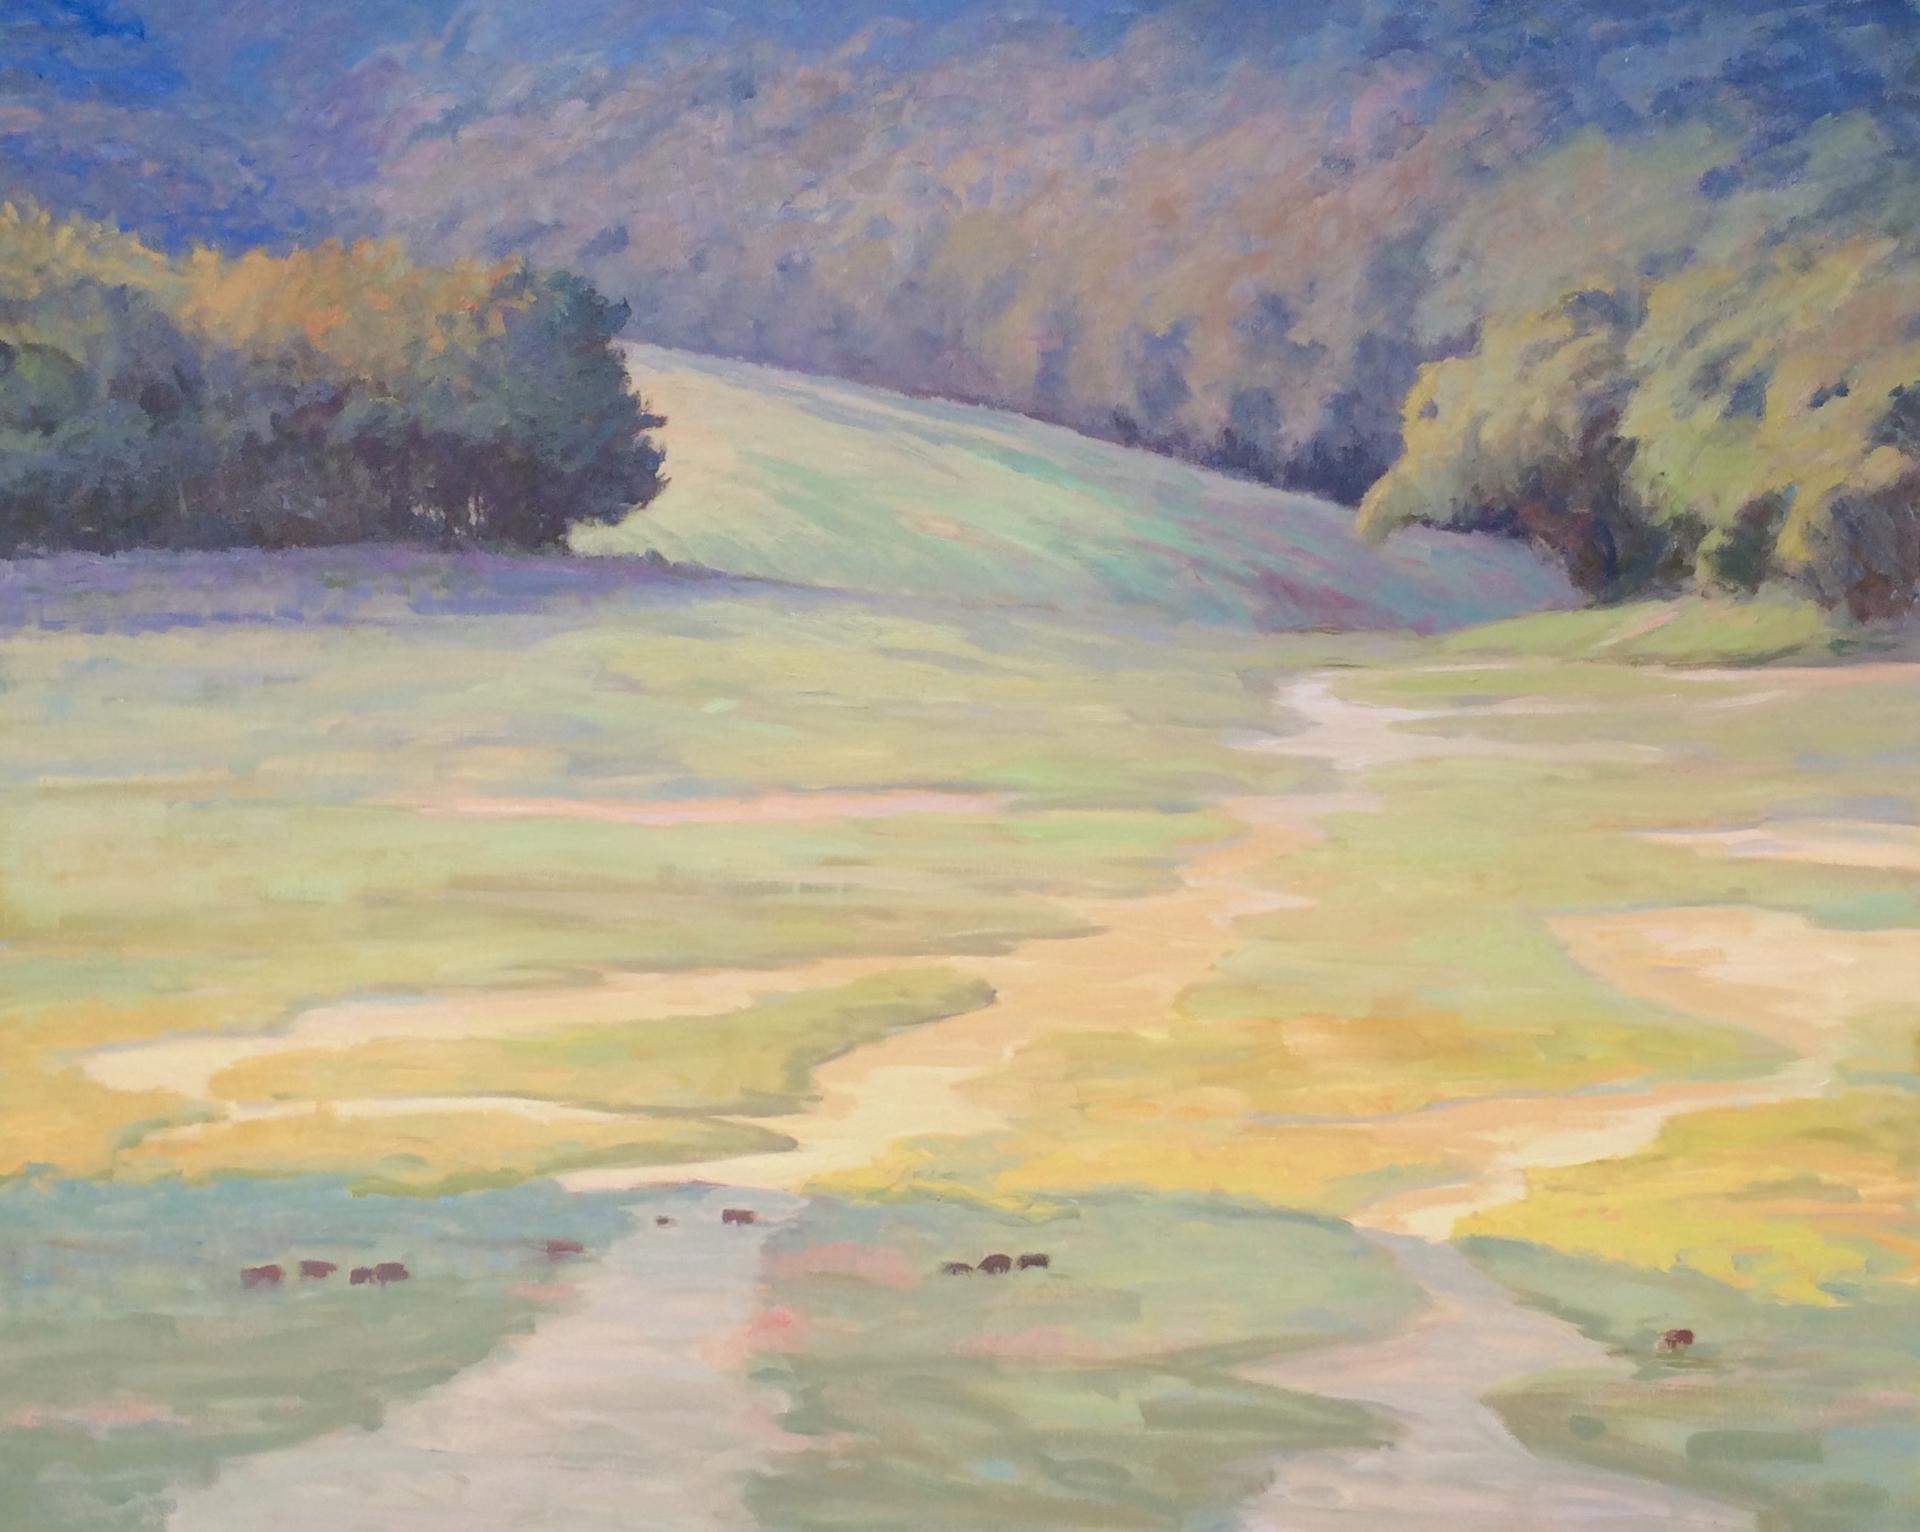 Mountain Cove by Joe Mullican